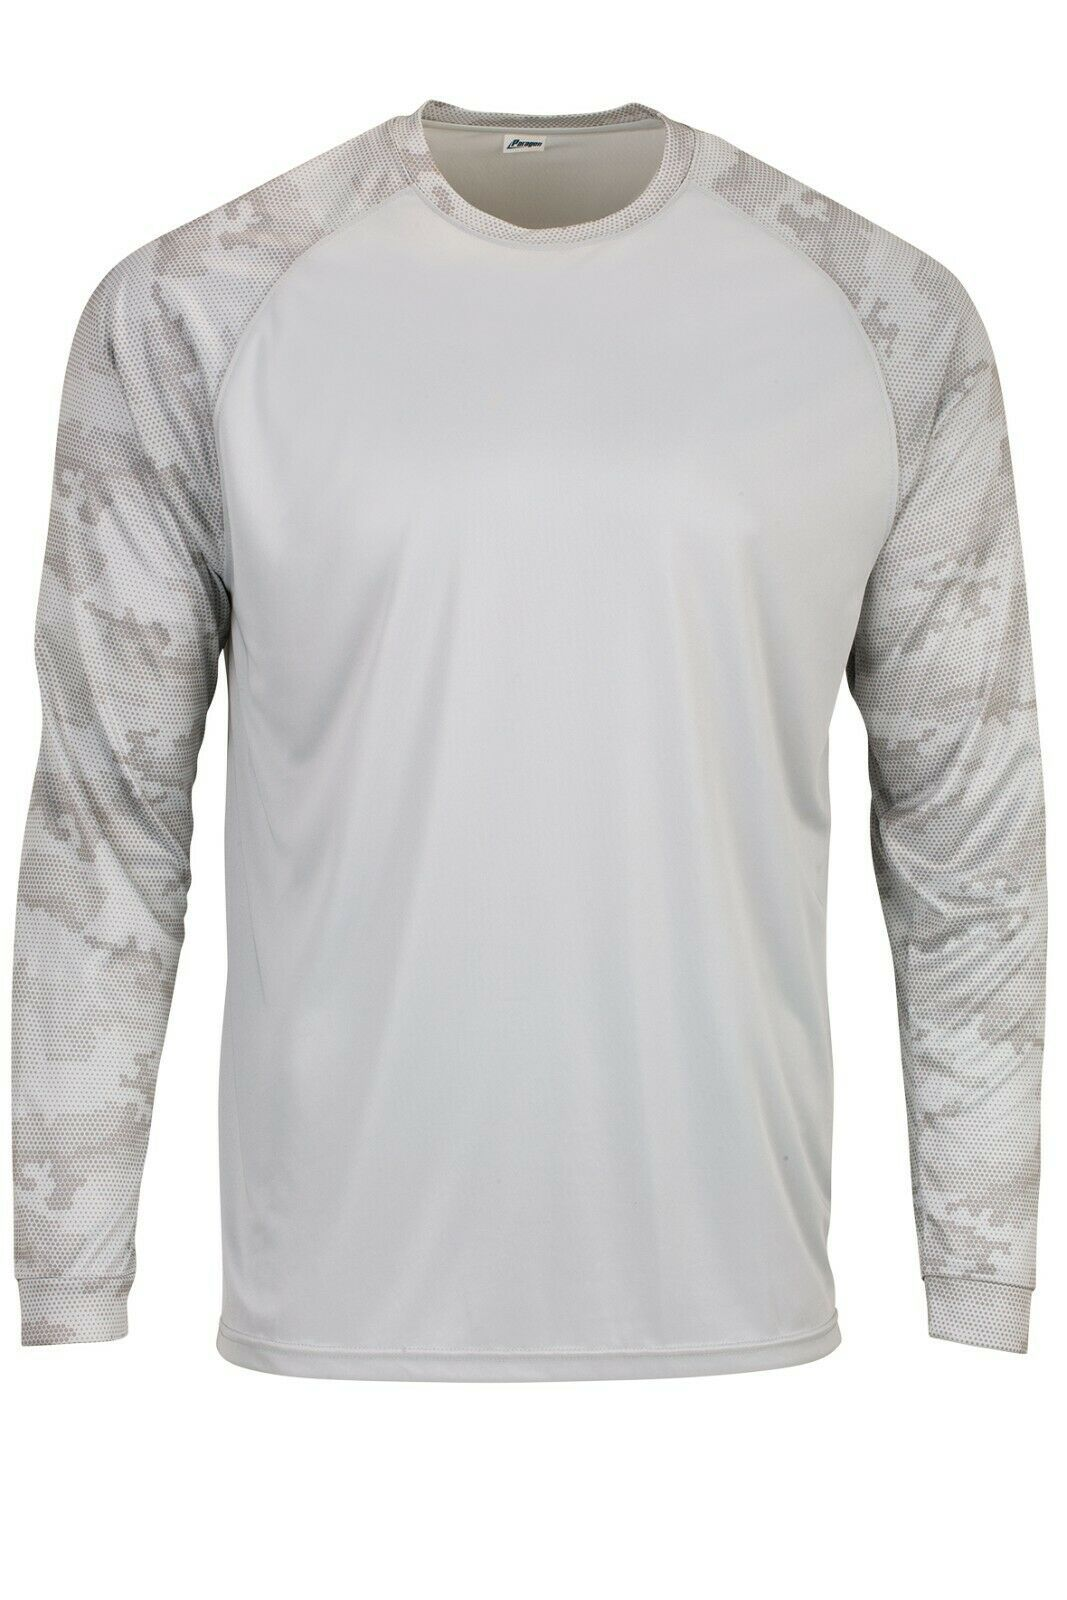 Sun Protection Long Sleeve Dri Fit Aluminum Gray sun shirt Camo Sleeve SPF 50+